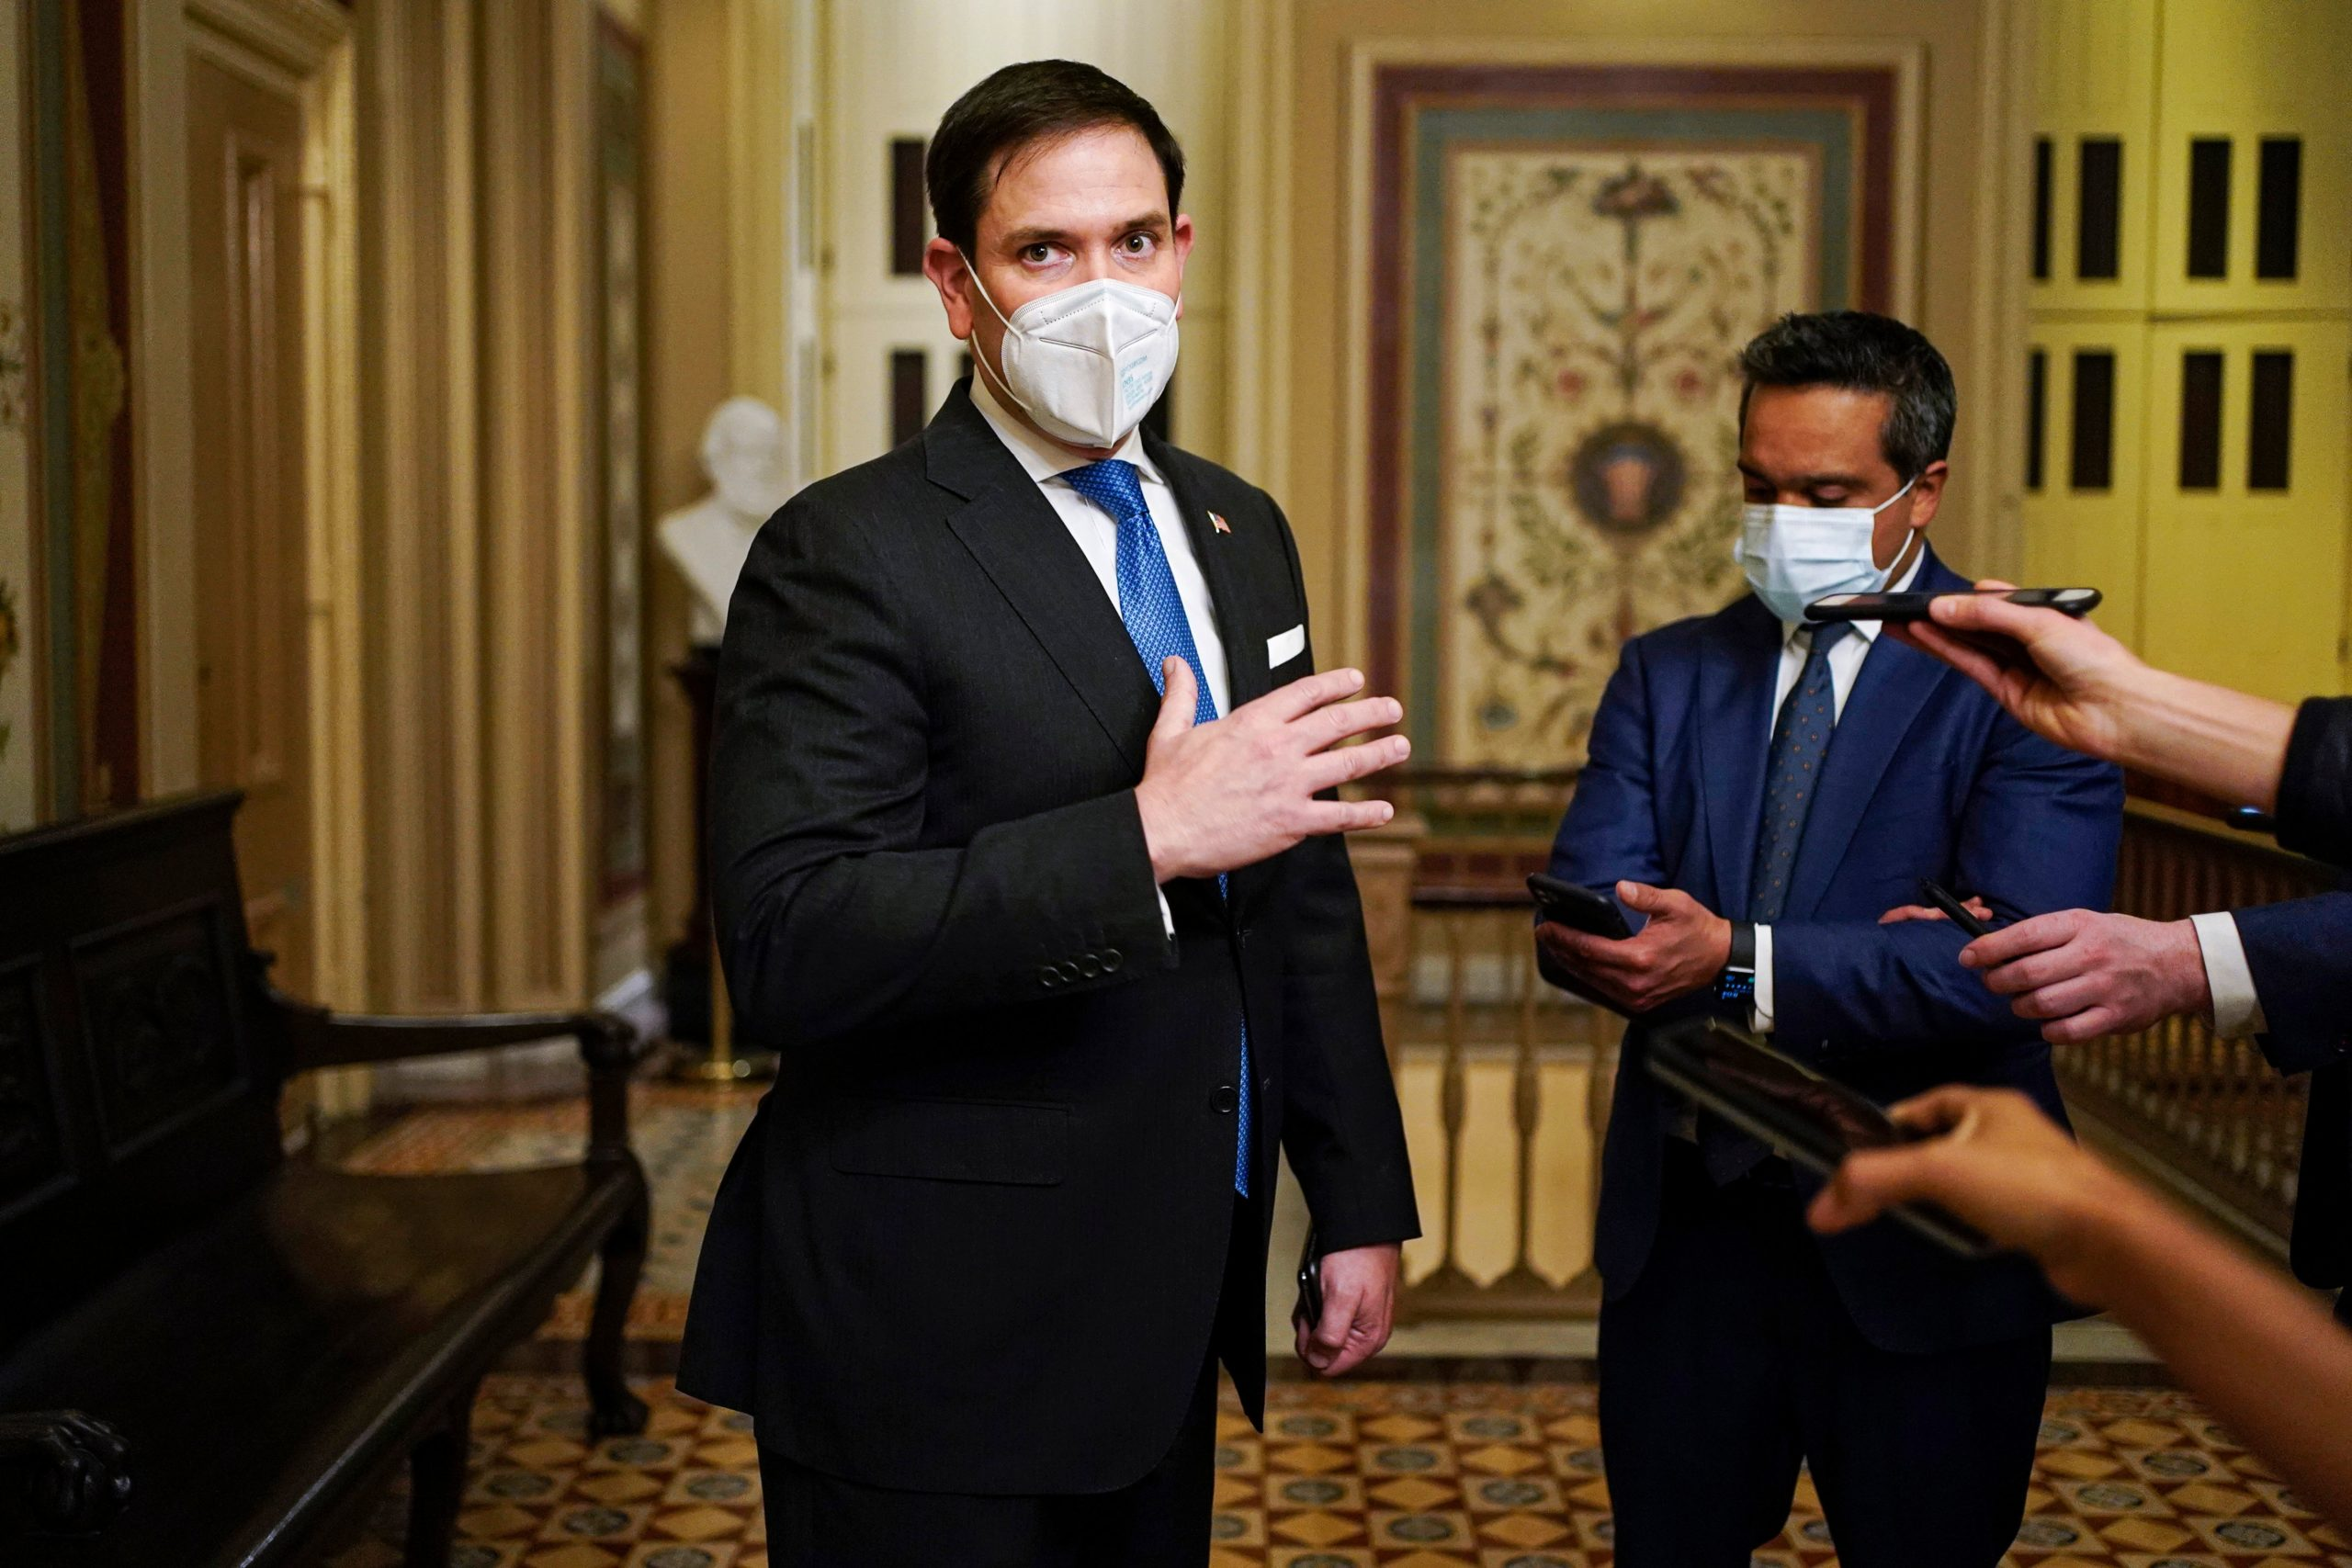 Senator Marco Rubio speaks to the press in February. (Joshua Roberts/Pool/AFP via Getty Images)